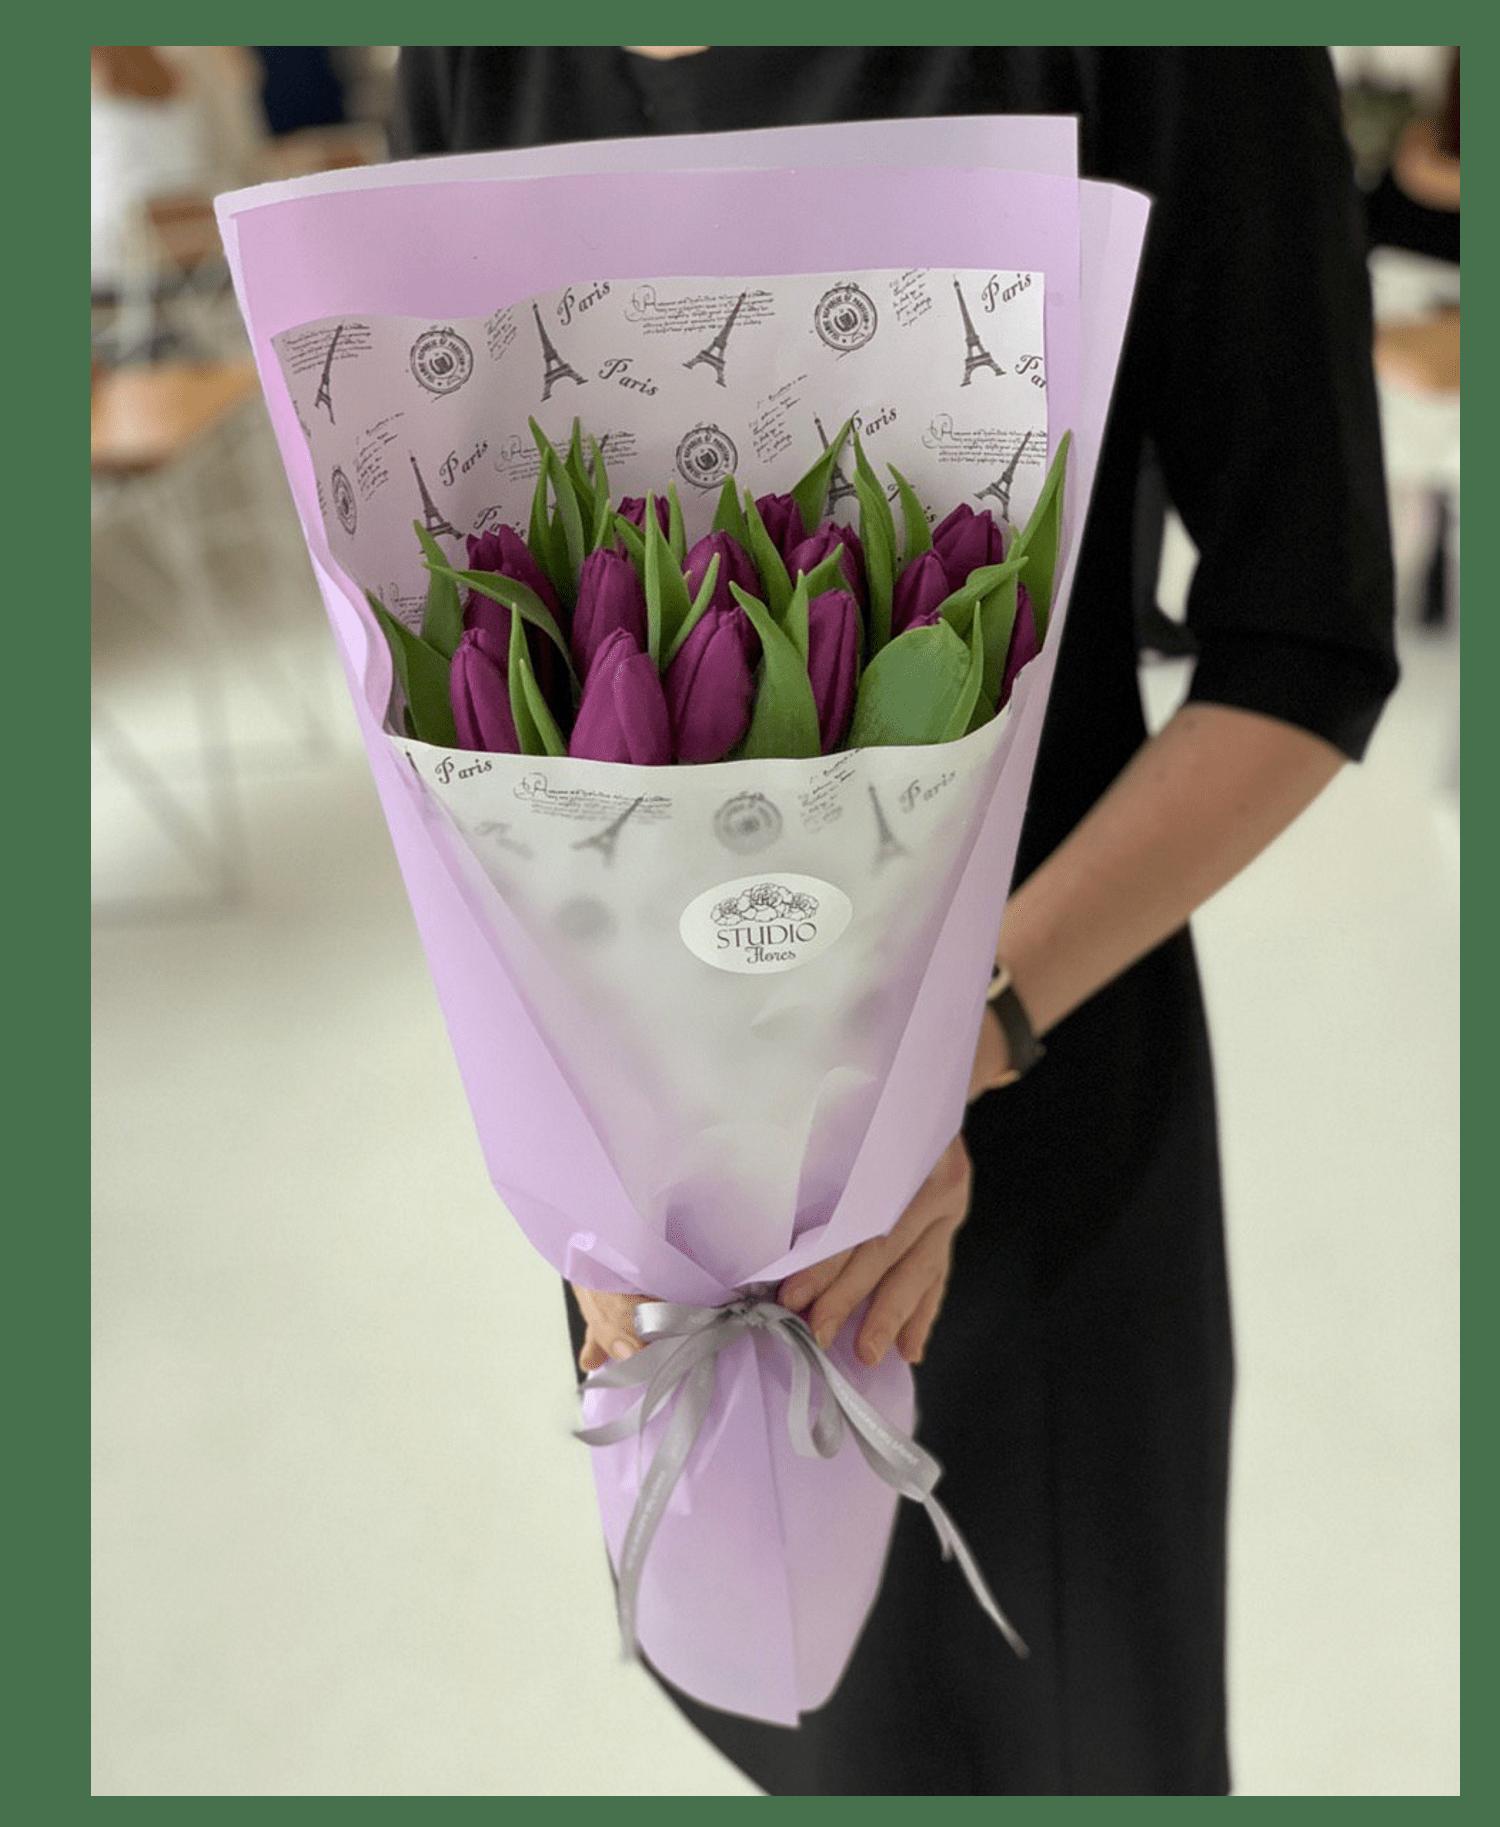 Букет 15 фиолетовых тюльпанов – Інтернет-магазин квітів STUDIO Flores